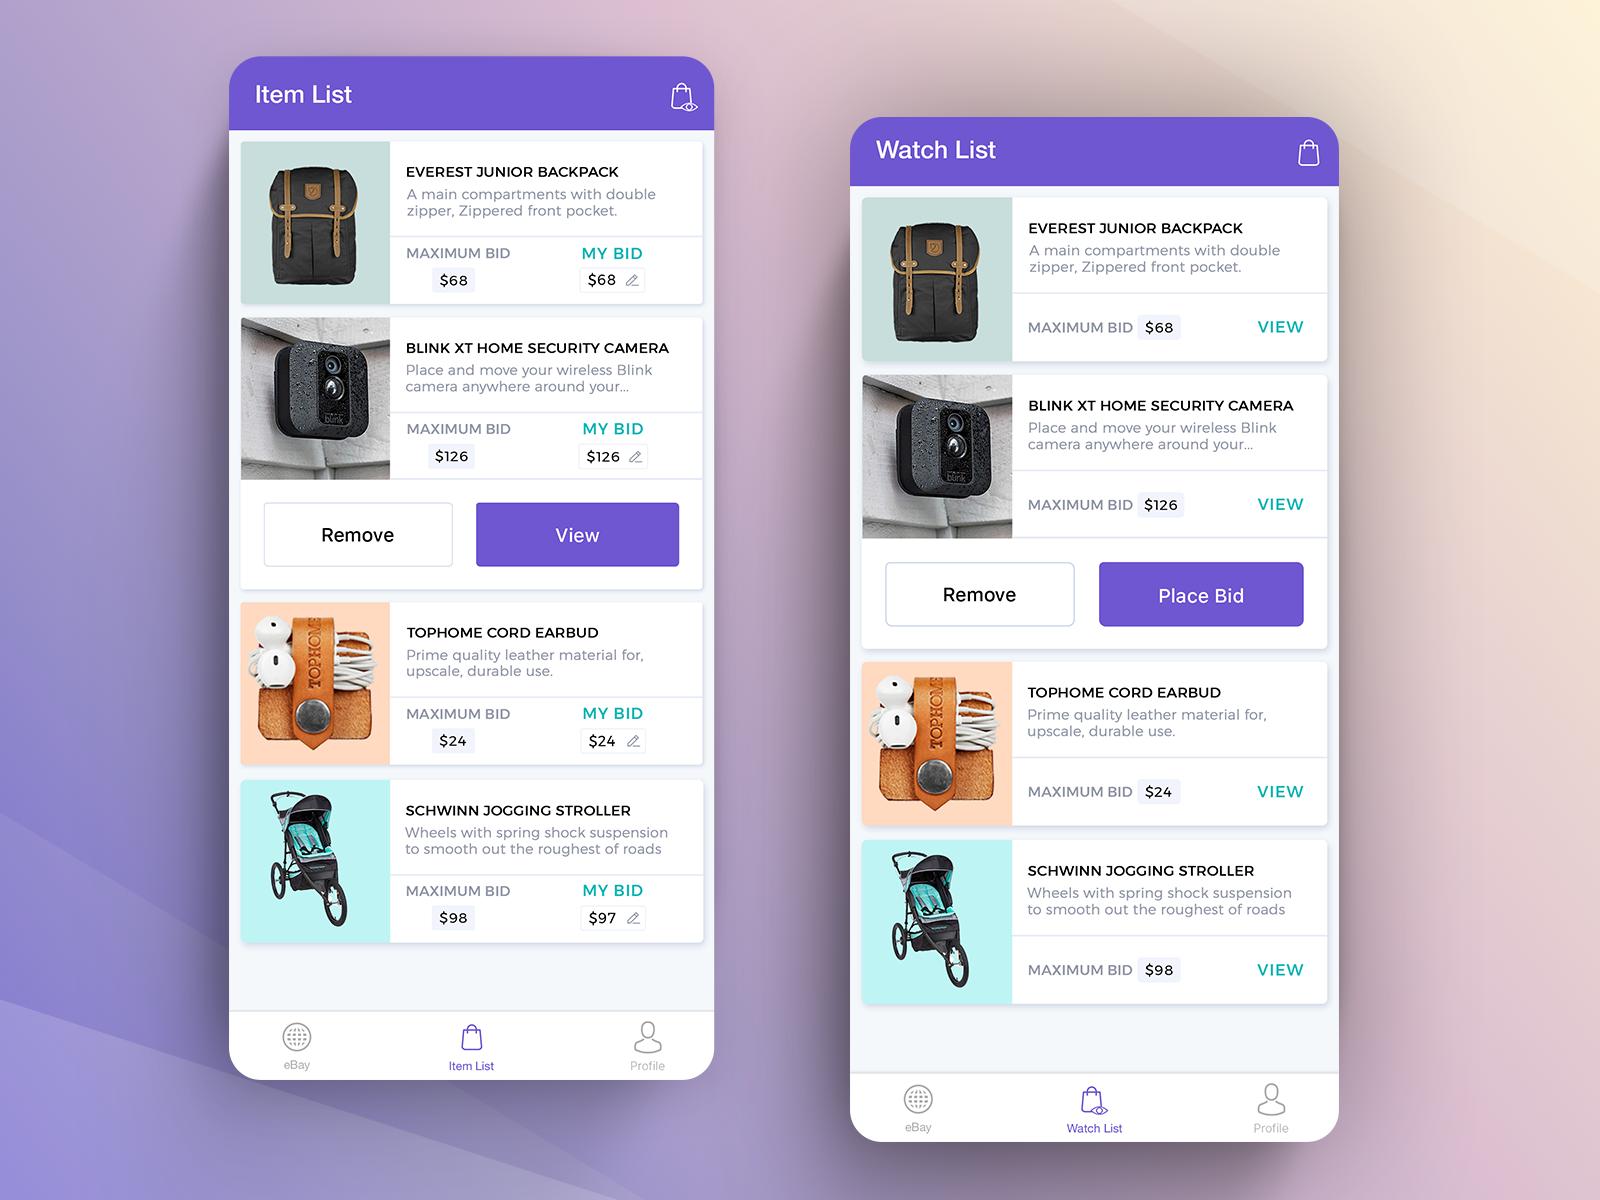 Ebay Auction App By Gtc Design Inspiration